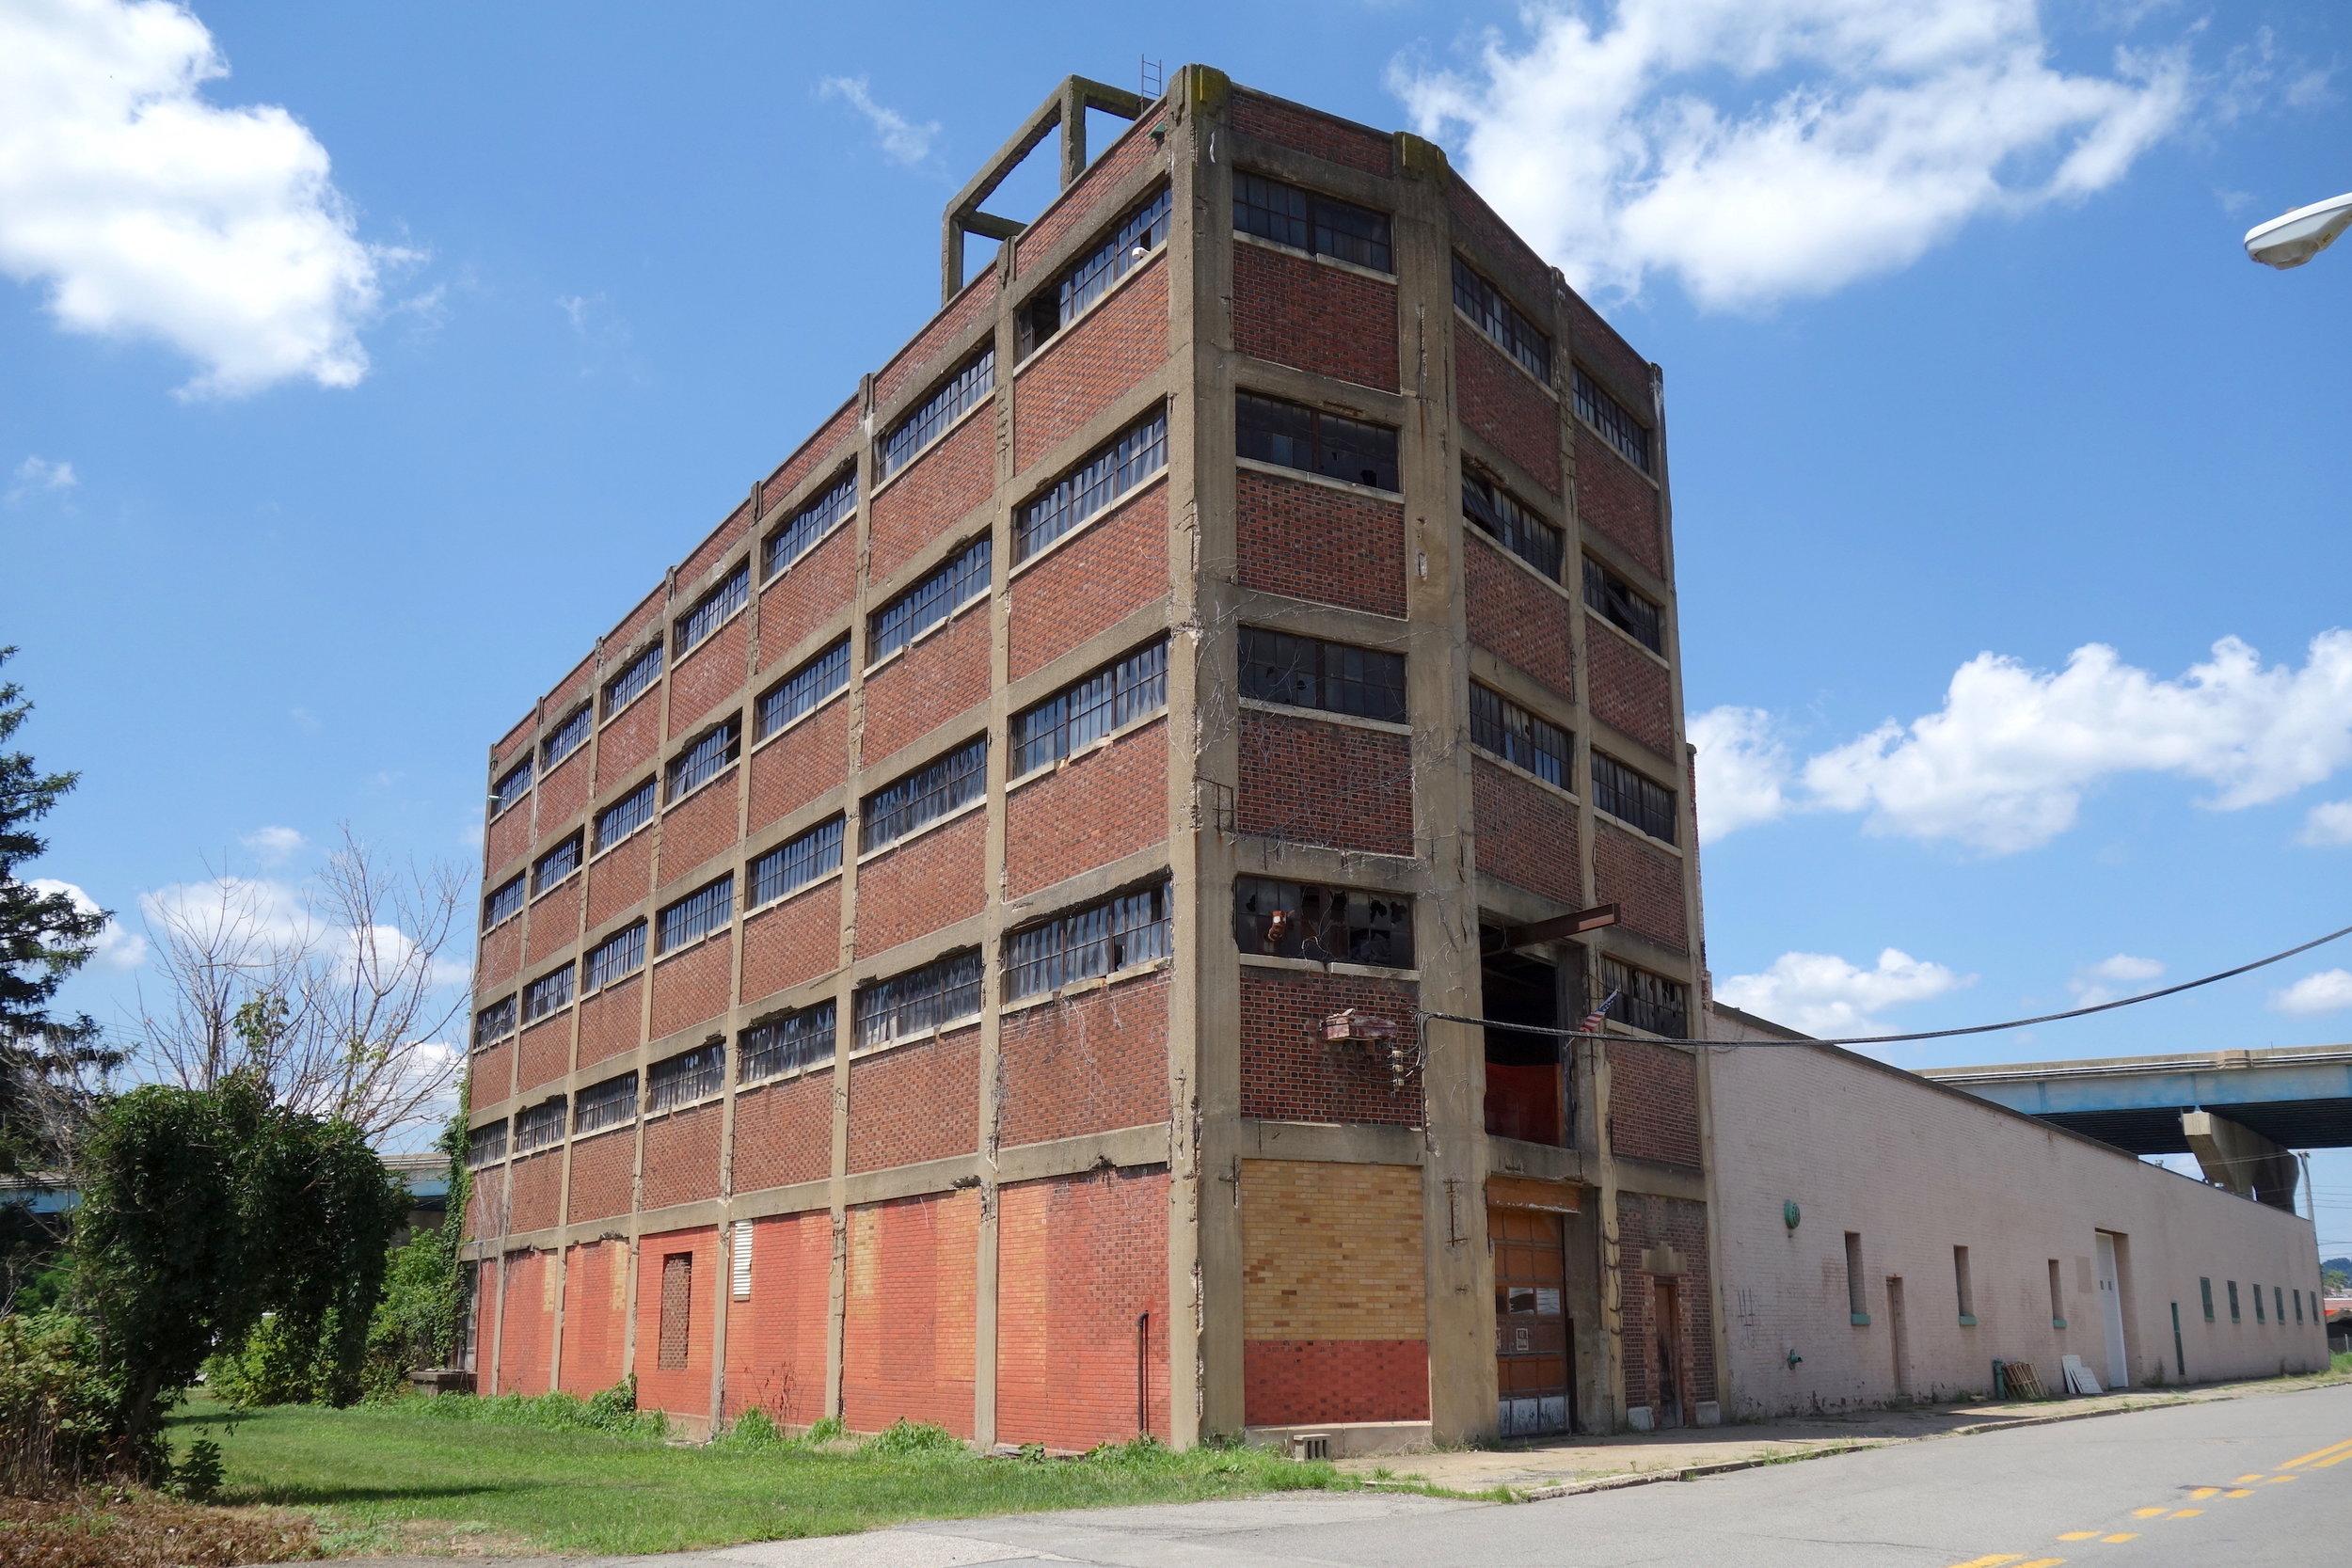 Figure 2. Abandoned warehouse, Wheeling,2016. Photograph by Joseph Heathcott.